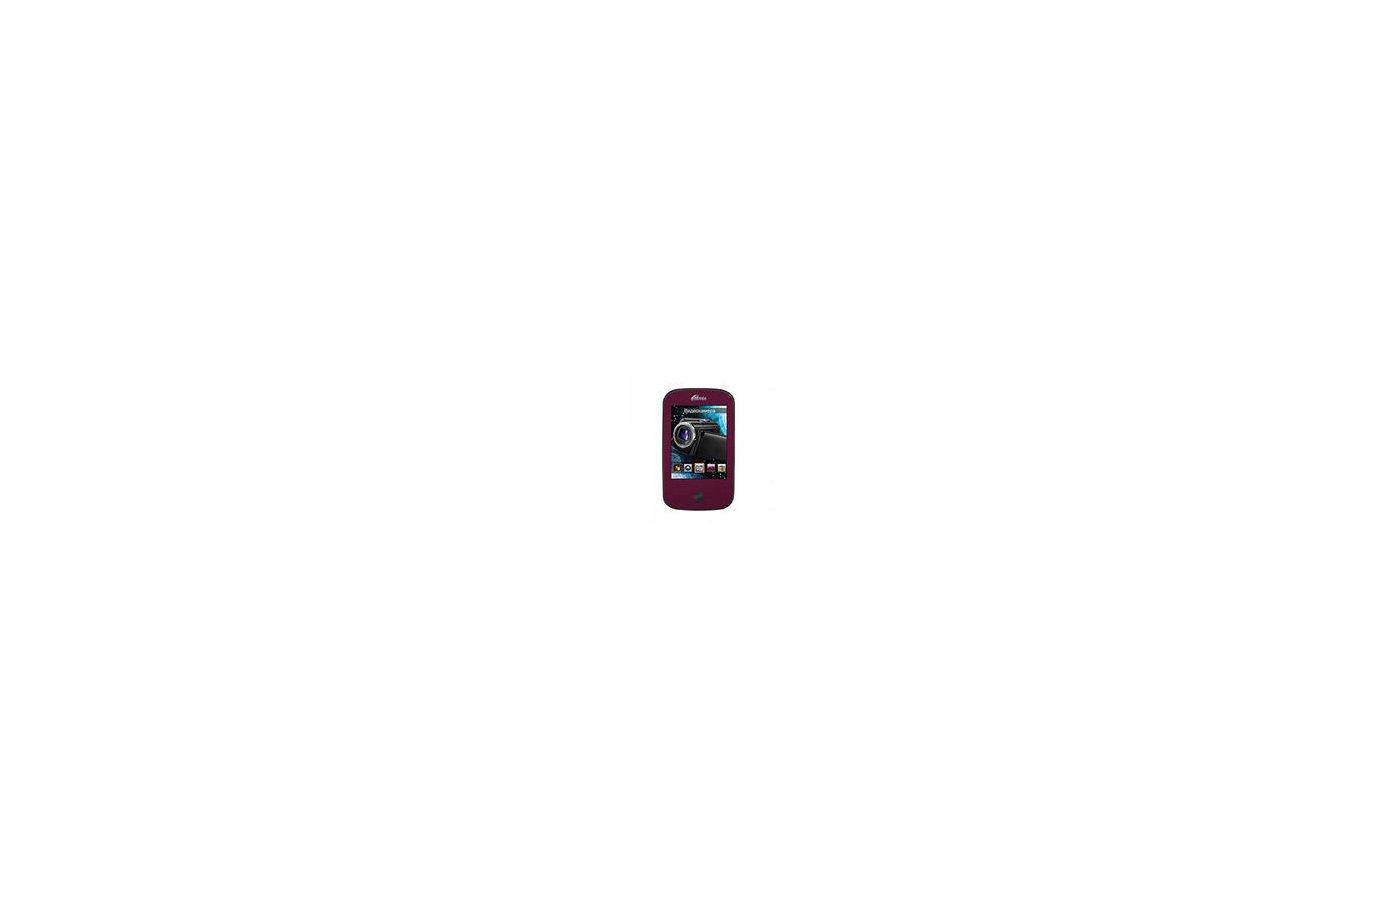 МР3 плеер Ritmix RF-7200 4Gb темно-красный